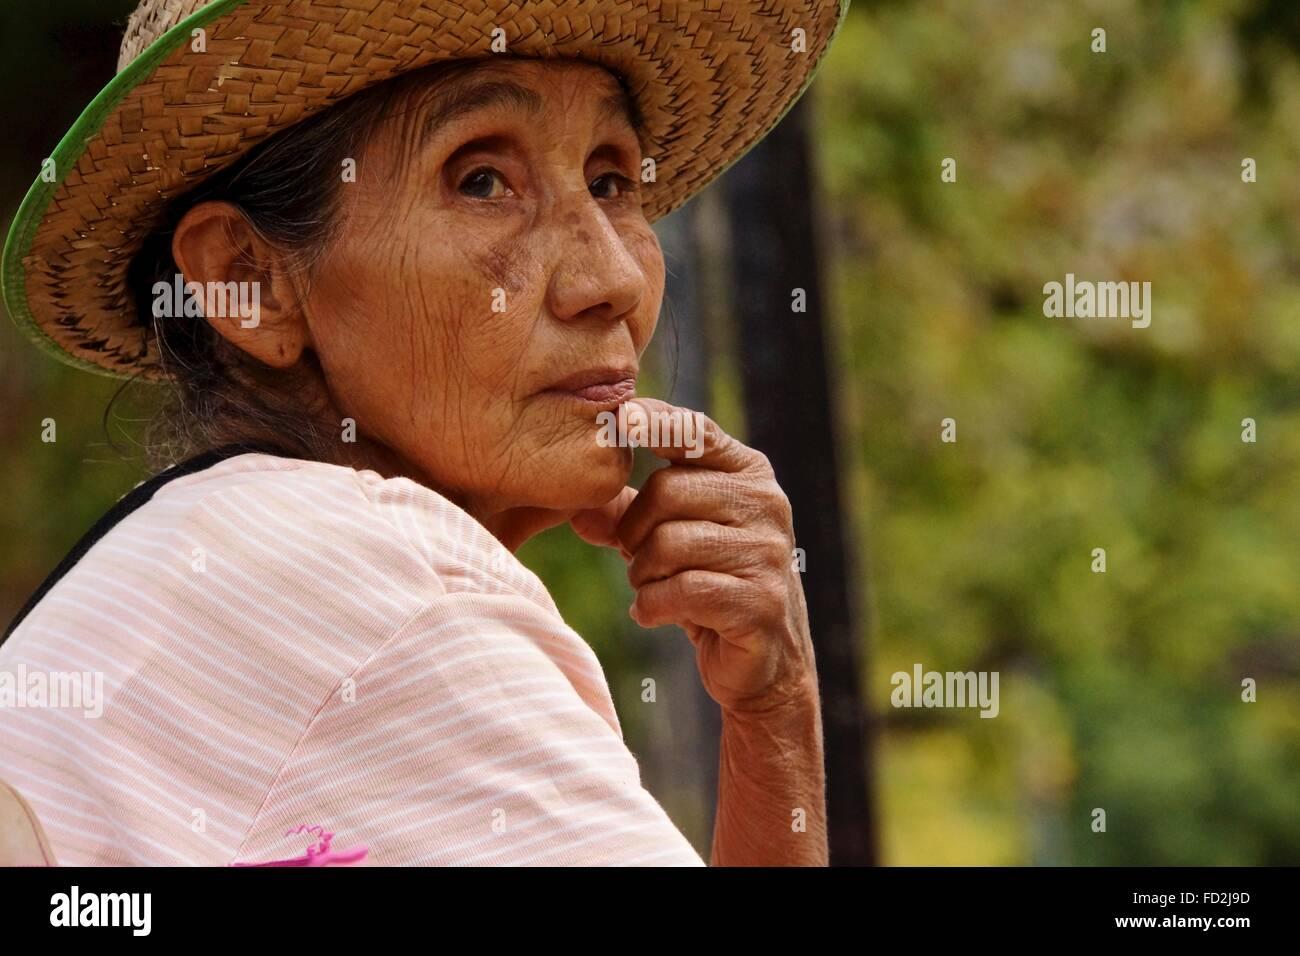 Dame Mexicaine regarder le monde passer. Photo Stock